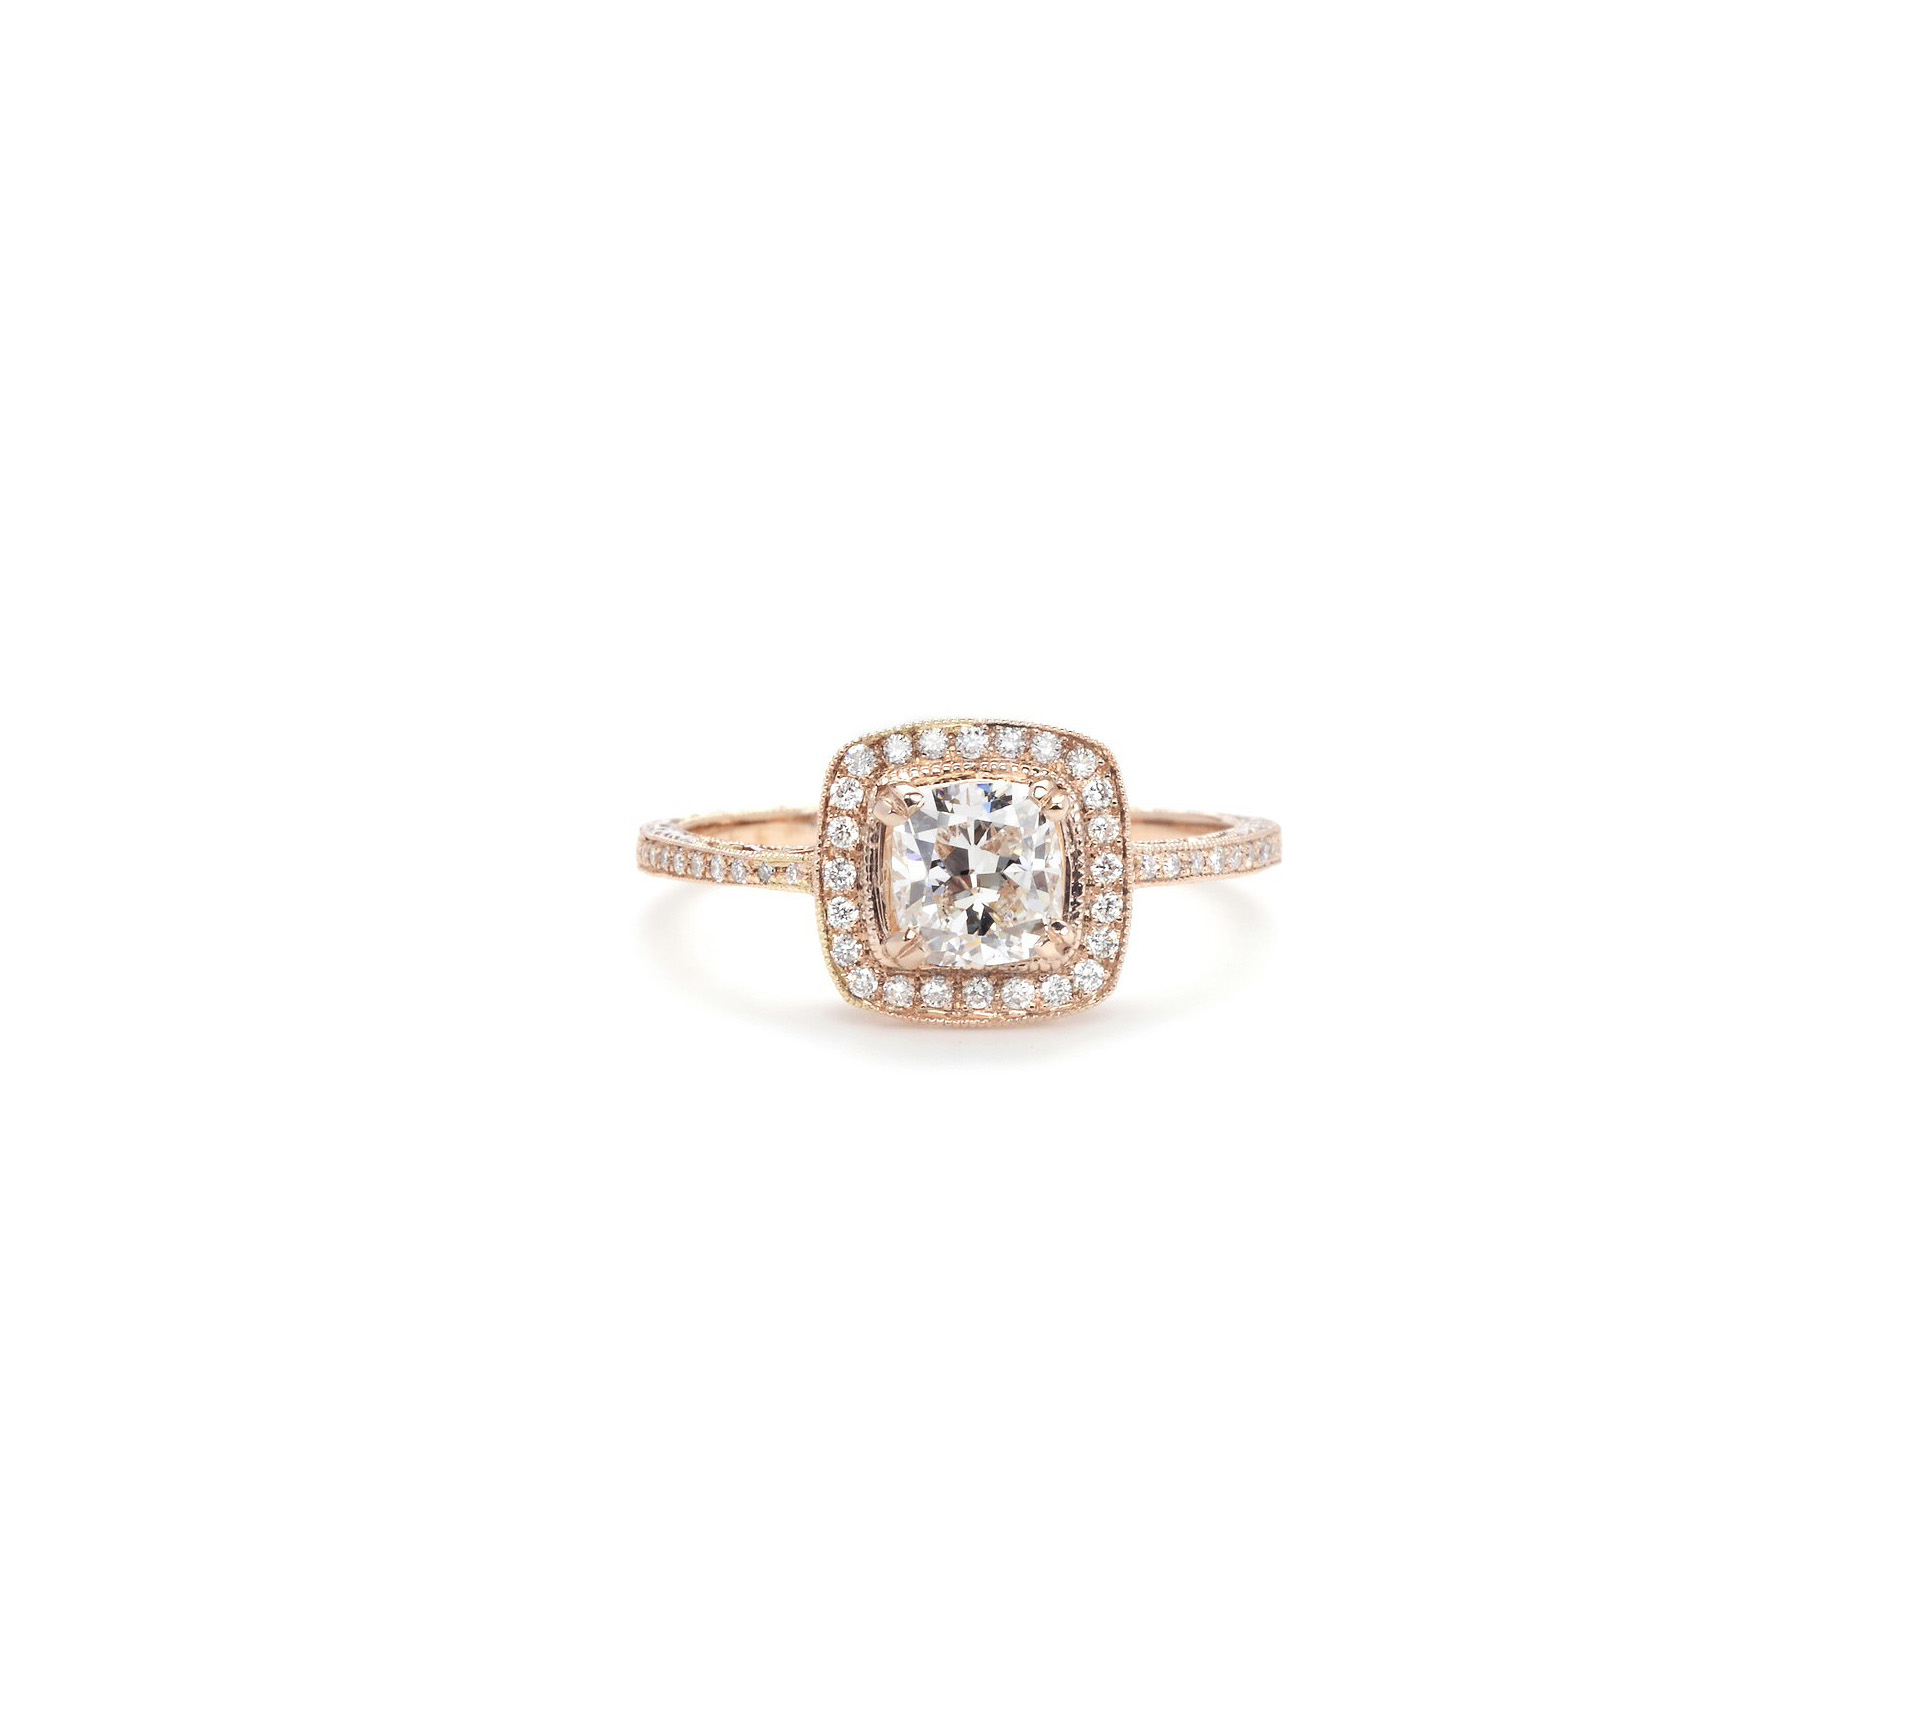 beverly k cushion cut diamond engagement ring rose gold